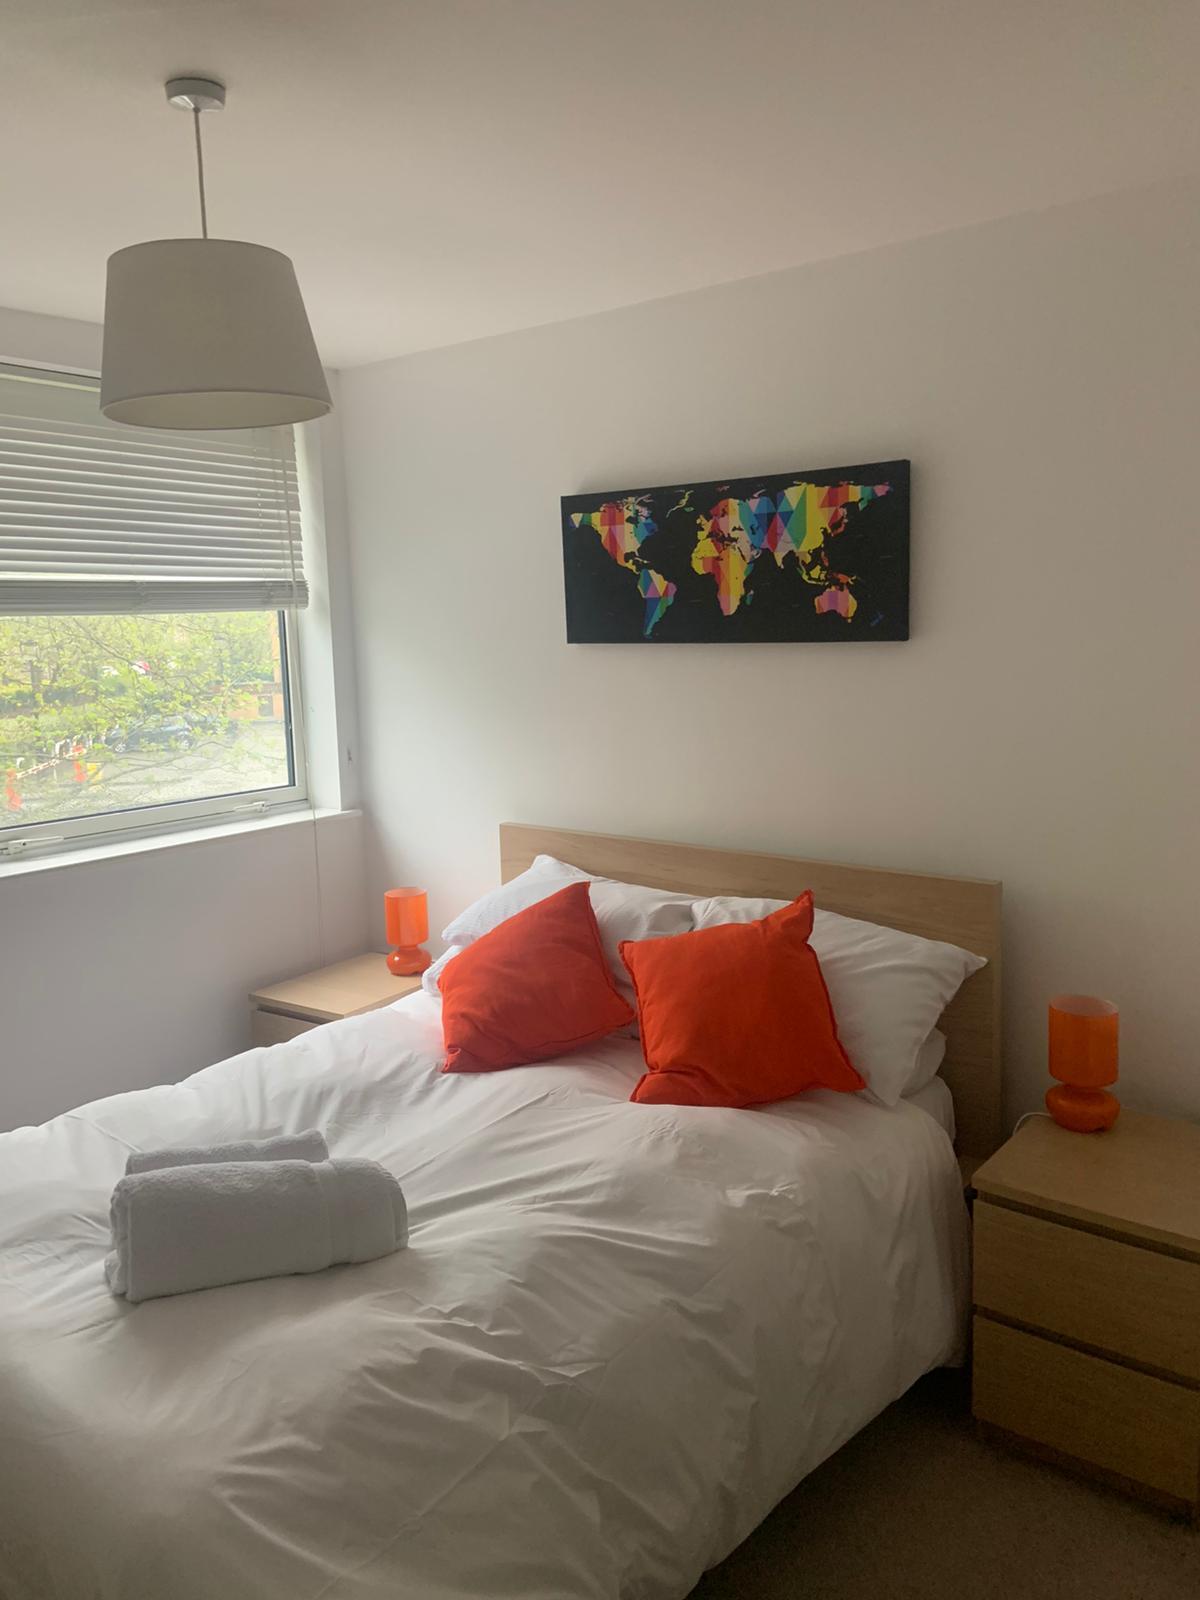 Bedding at Ocean Village Serviced Apartments, Ocean Village, Southampton